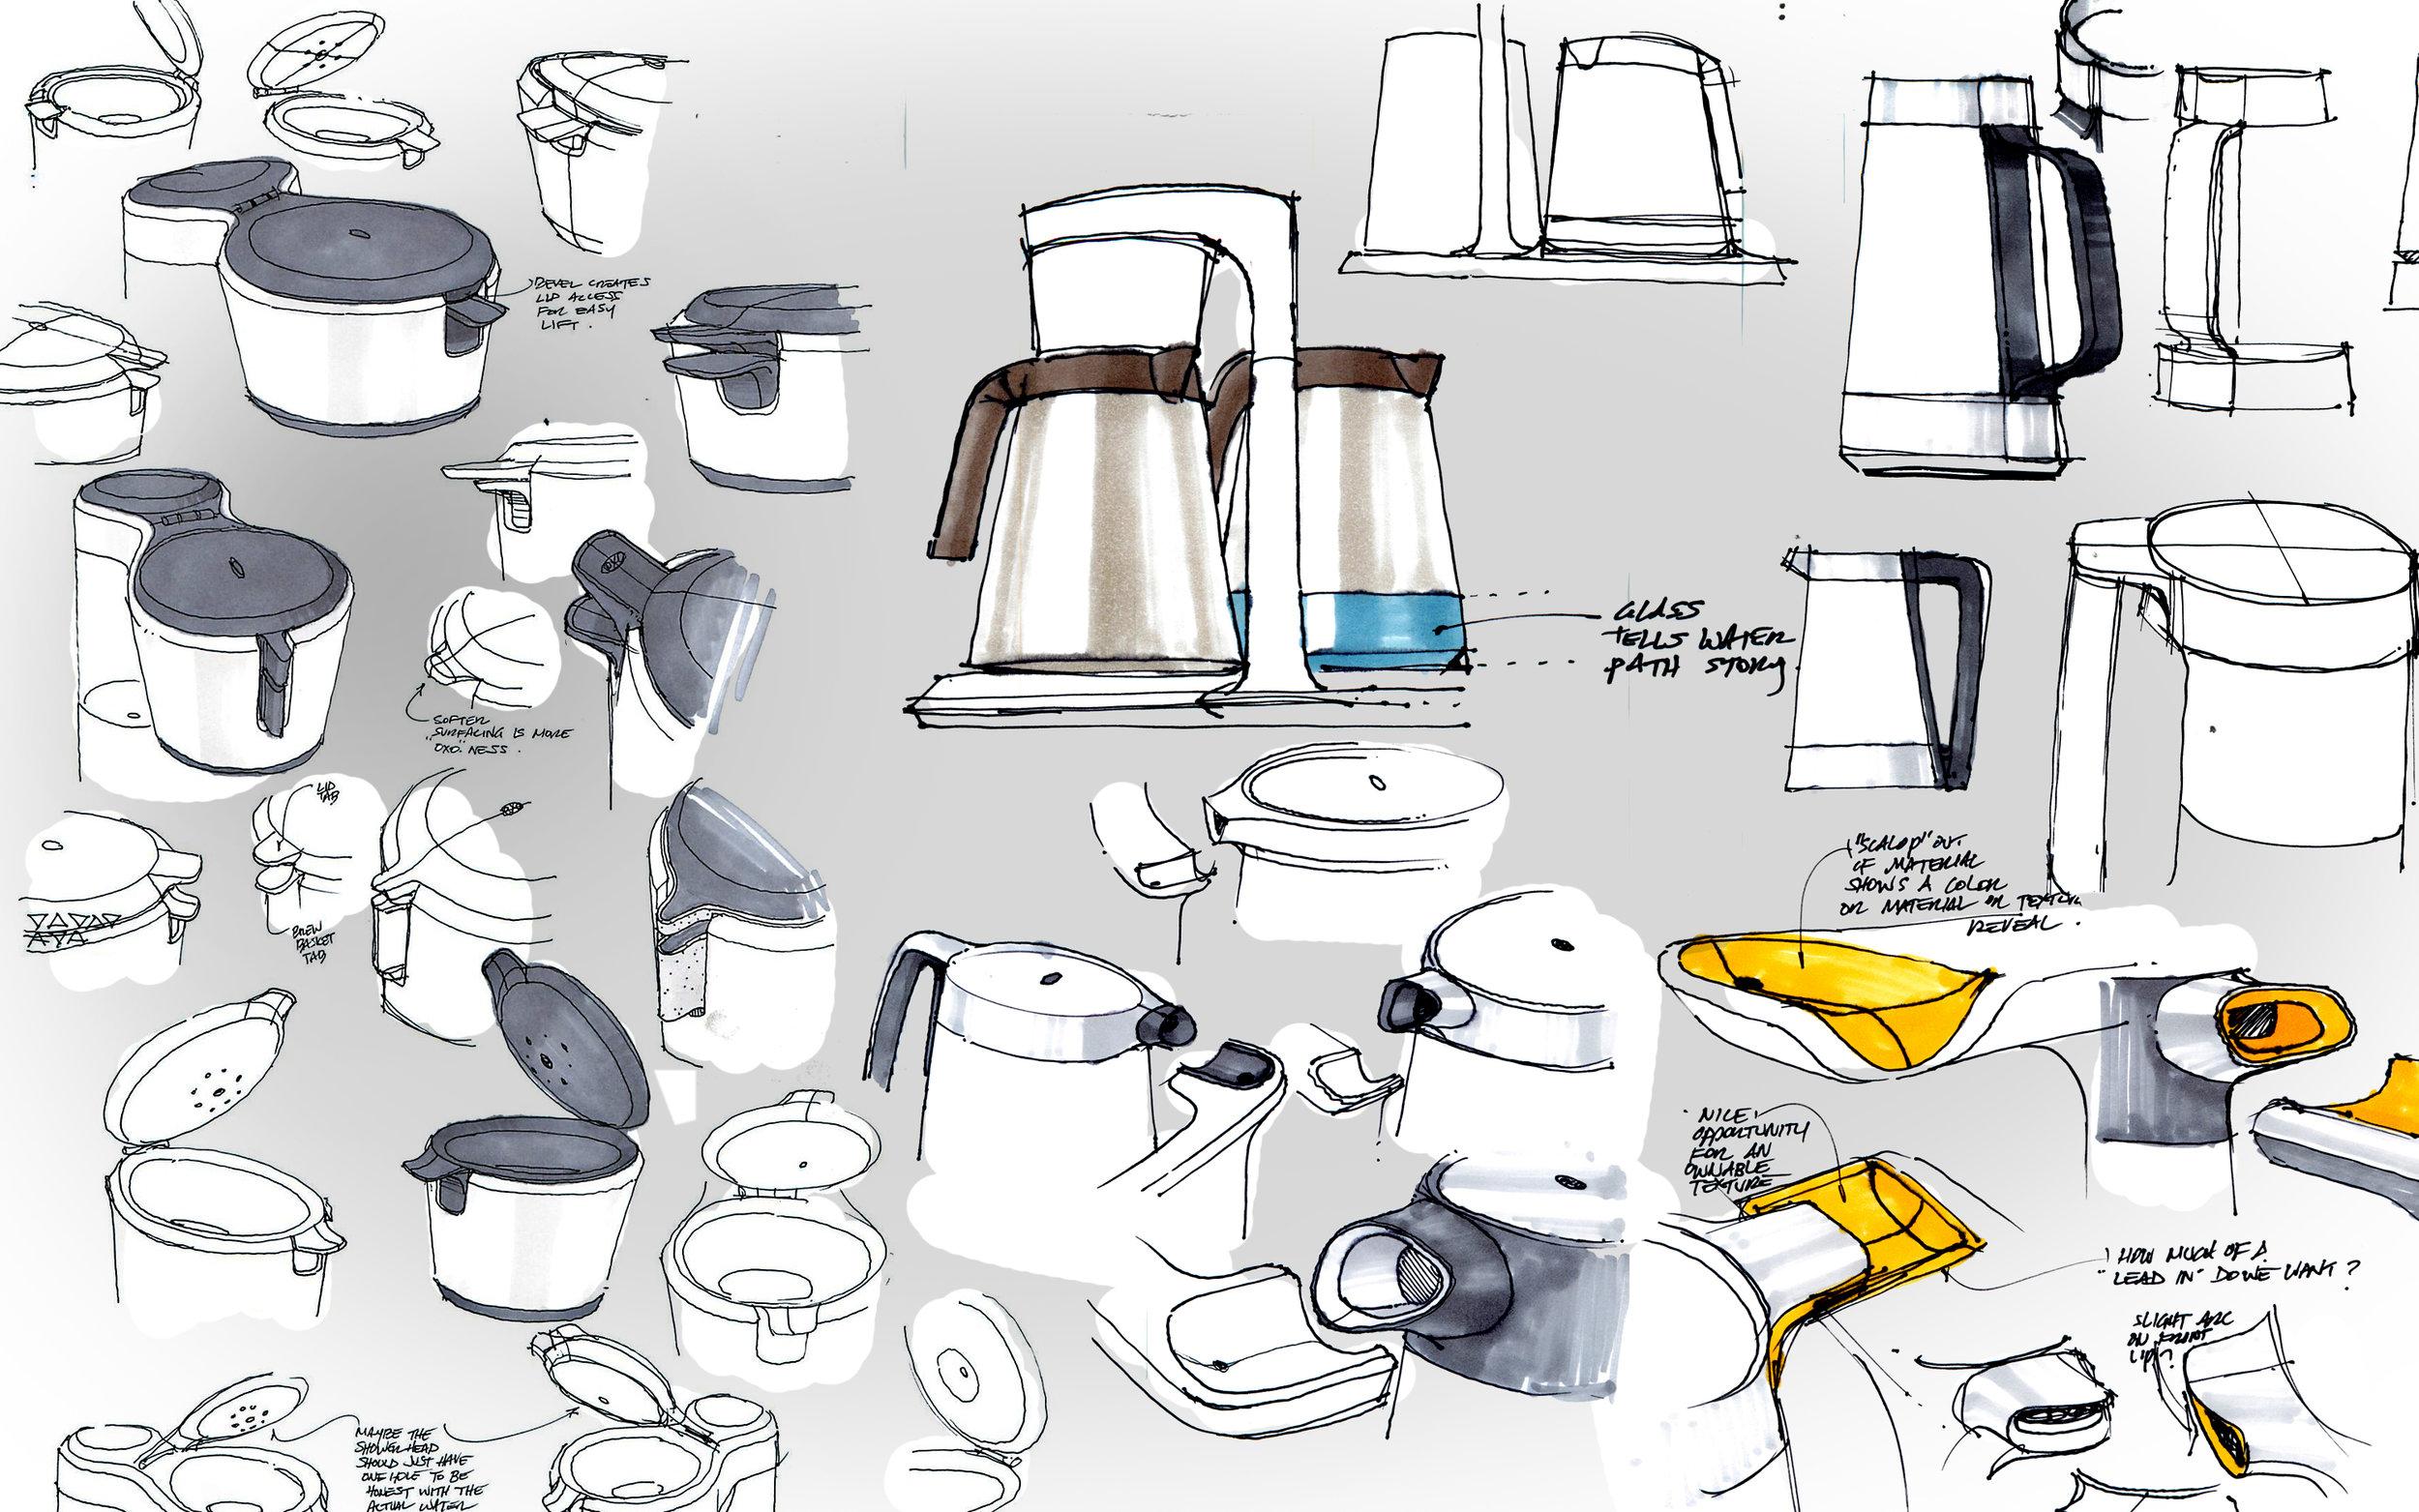 OXO_Electrics_Sketch_compilation4_051813.jpg